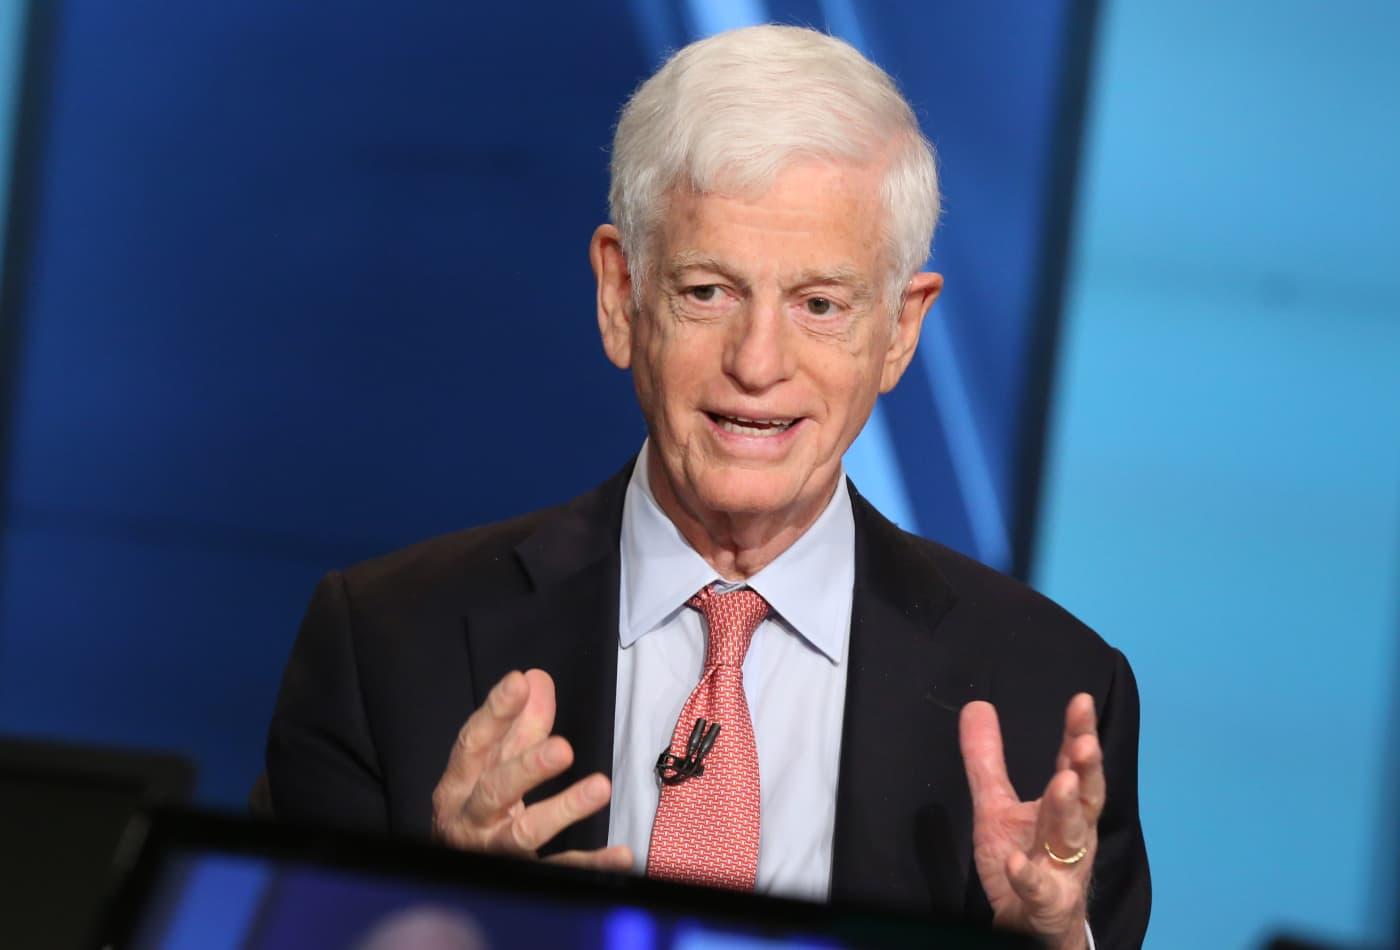 Mario Gabelli sees 'extraordinarily good' U.S. economic growth in 2021